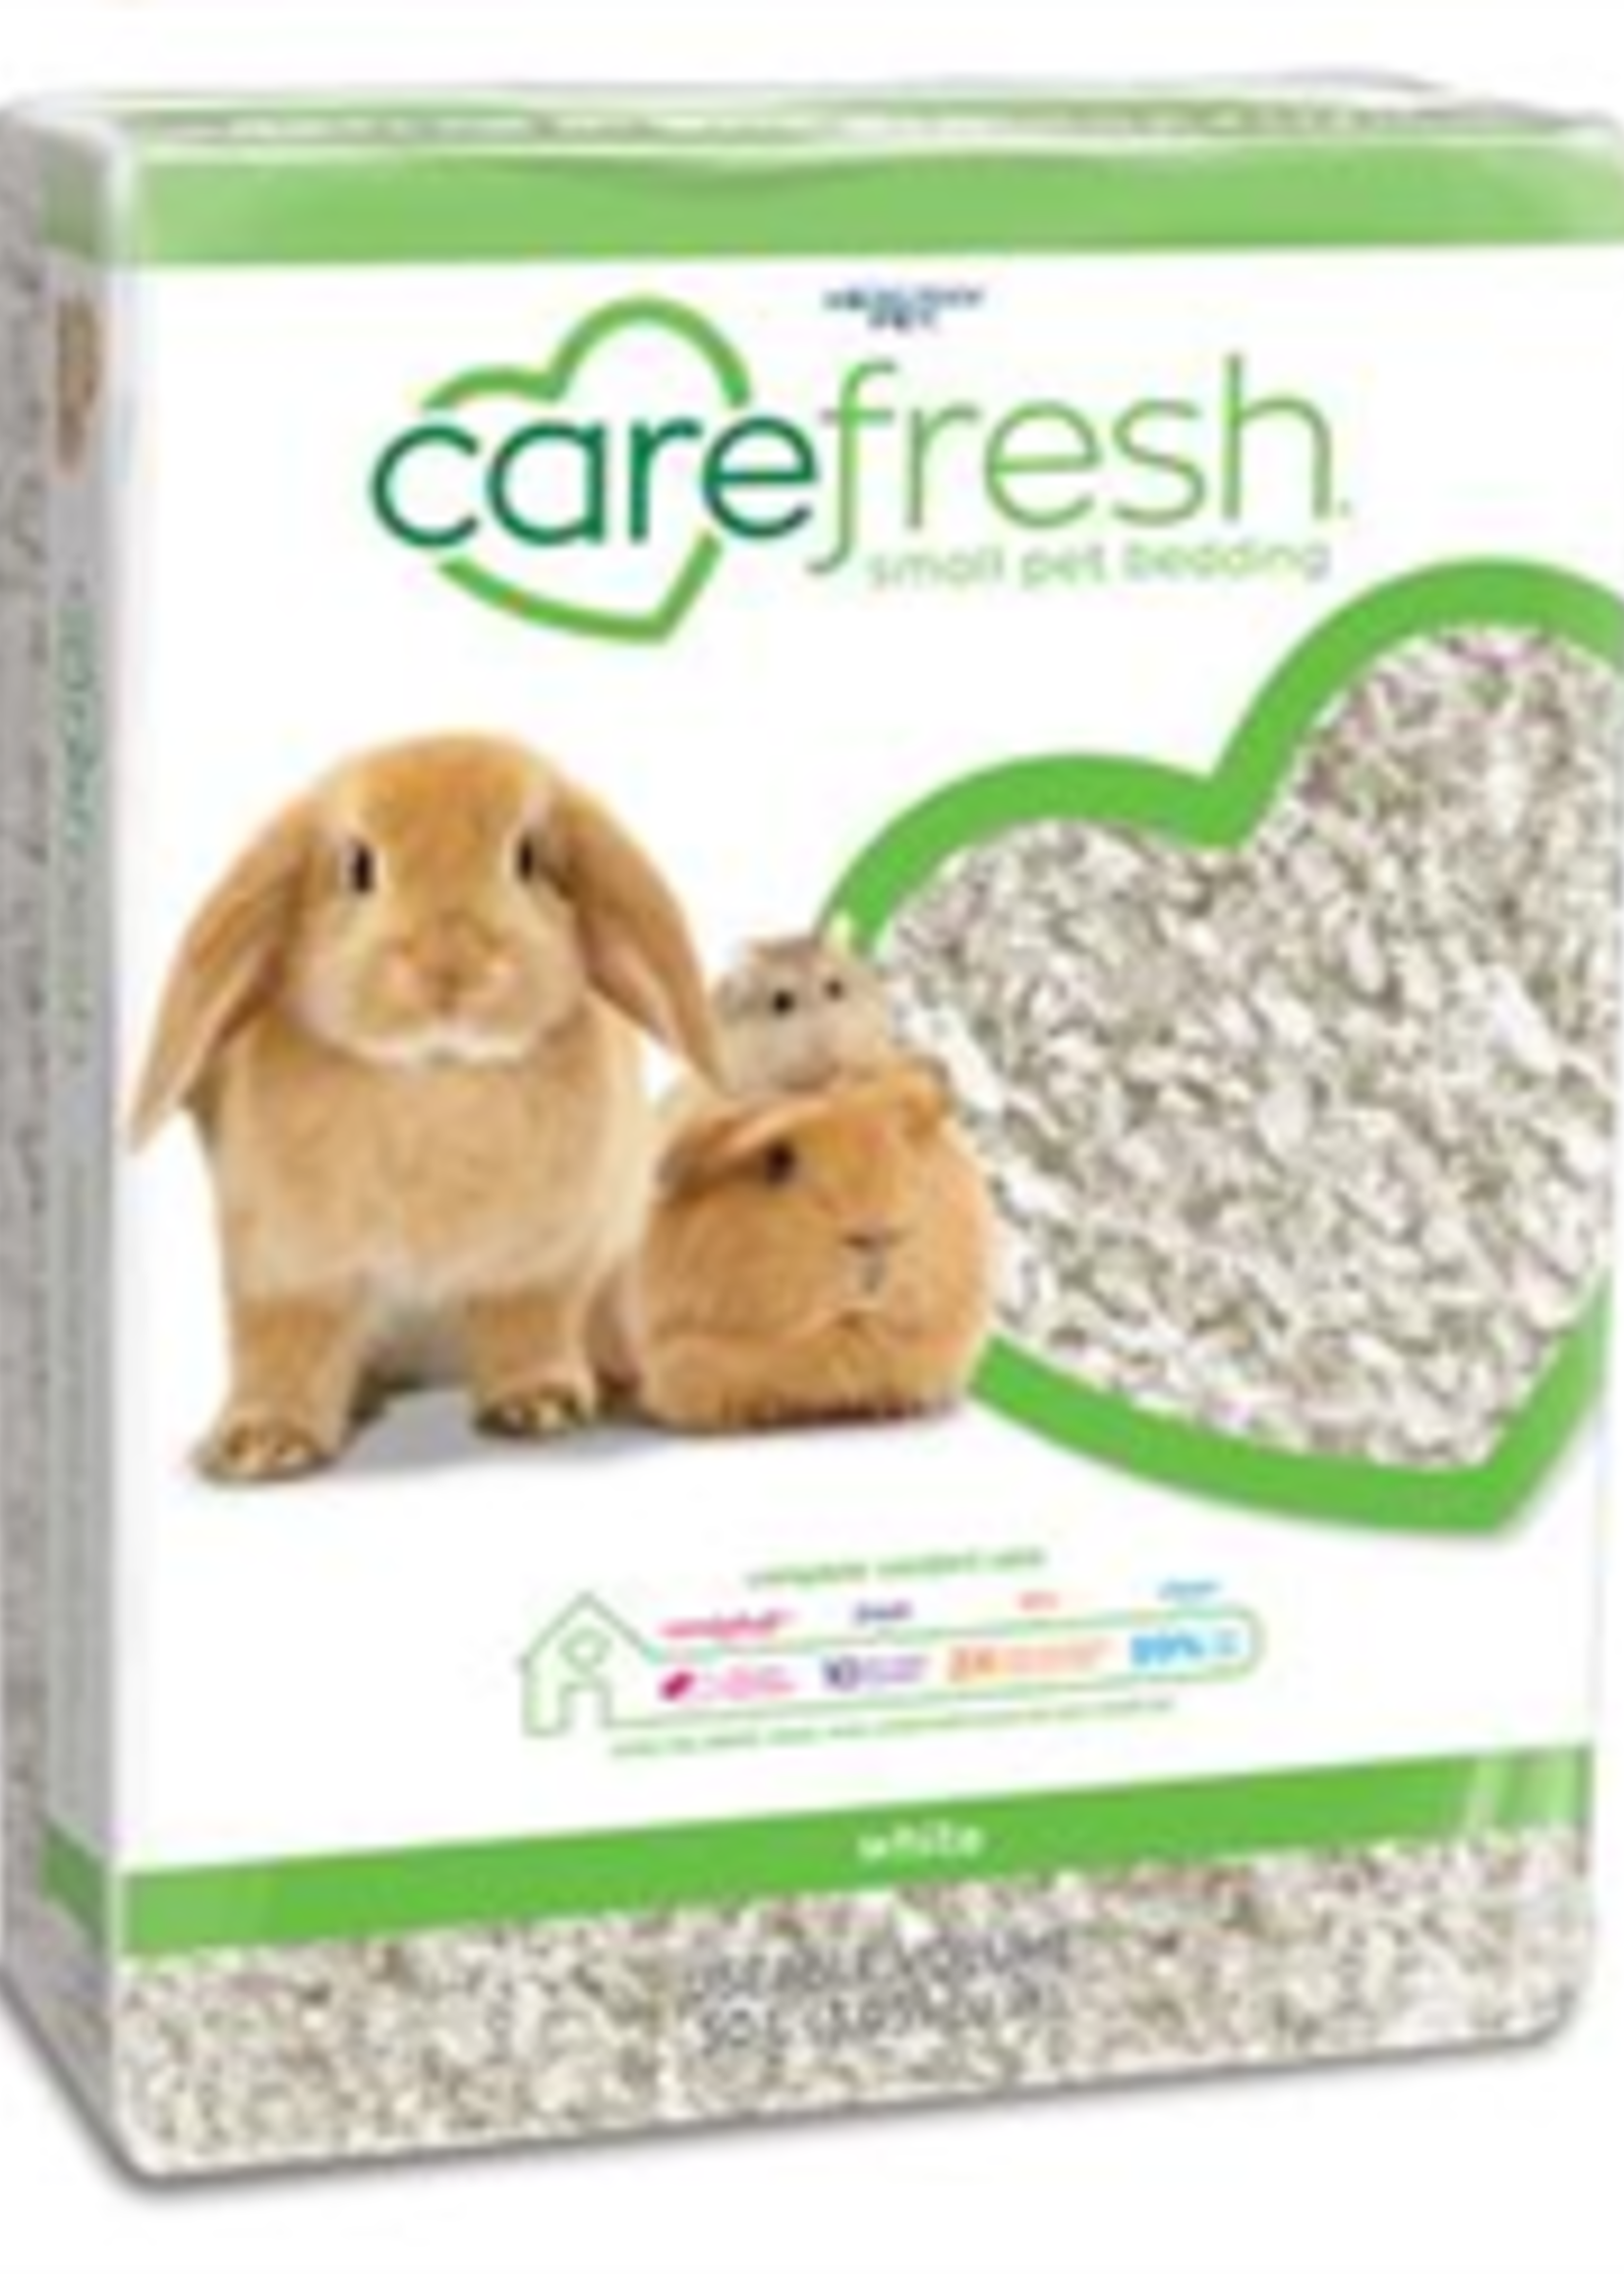 Carefresh® Carefresh® Small Pet Bedding White 50L